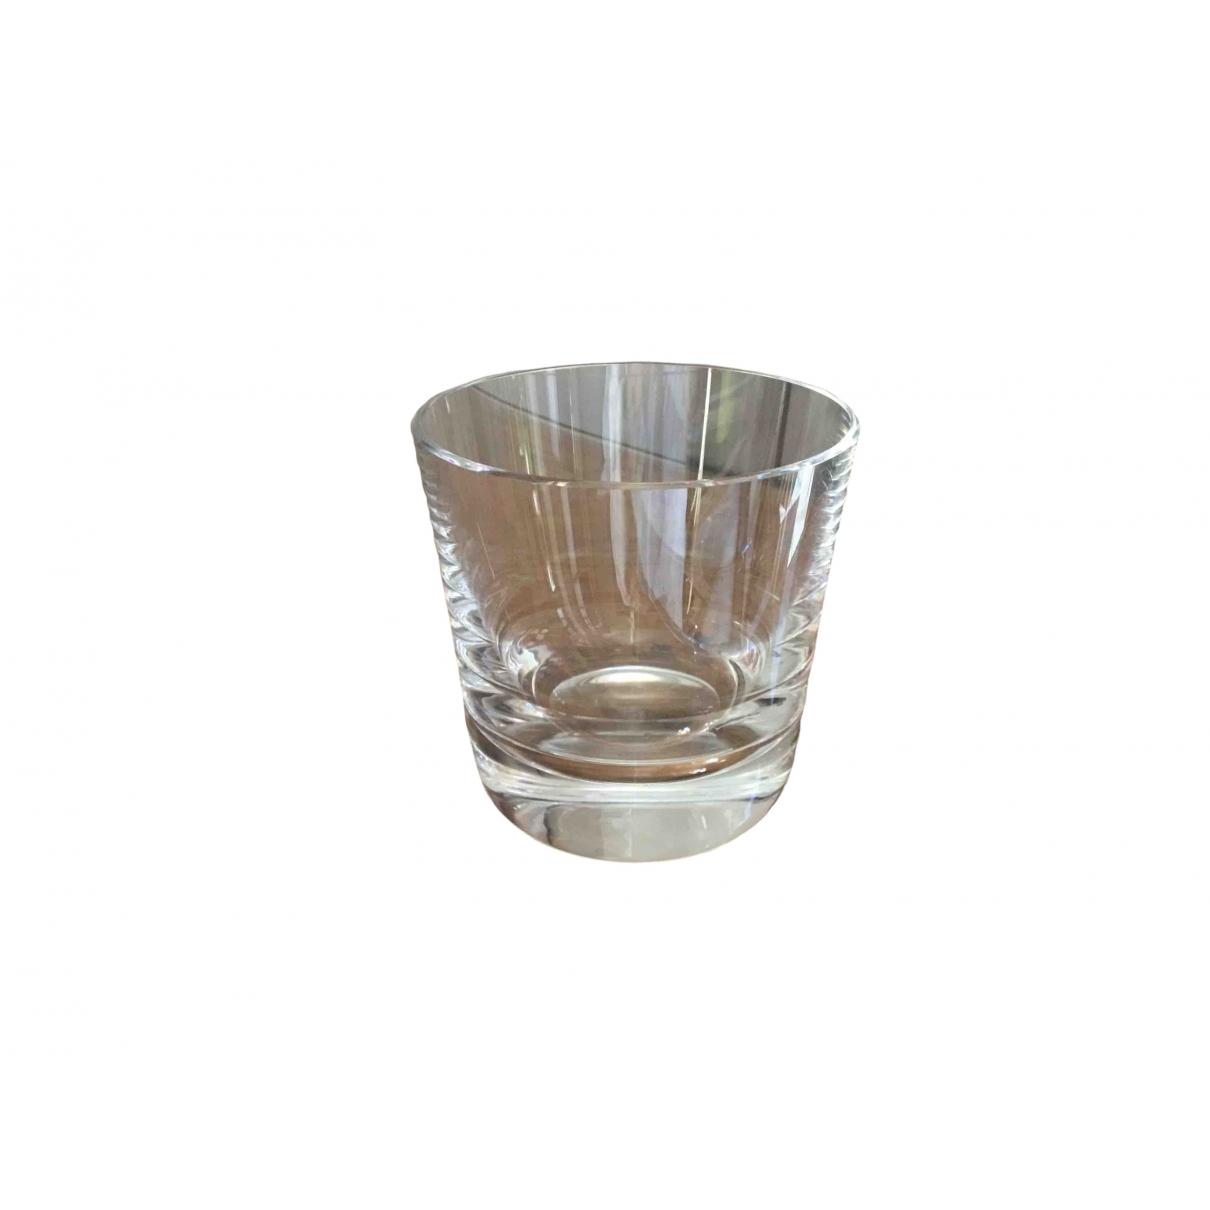 Baccarat \N Tischkultur in  Weiss Kristall